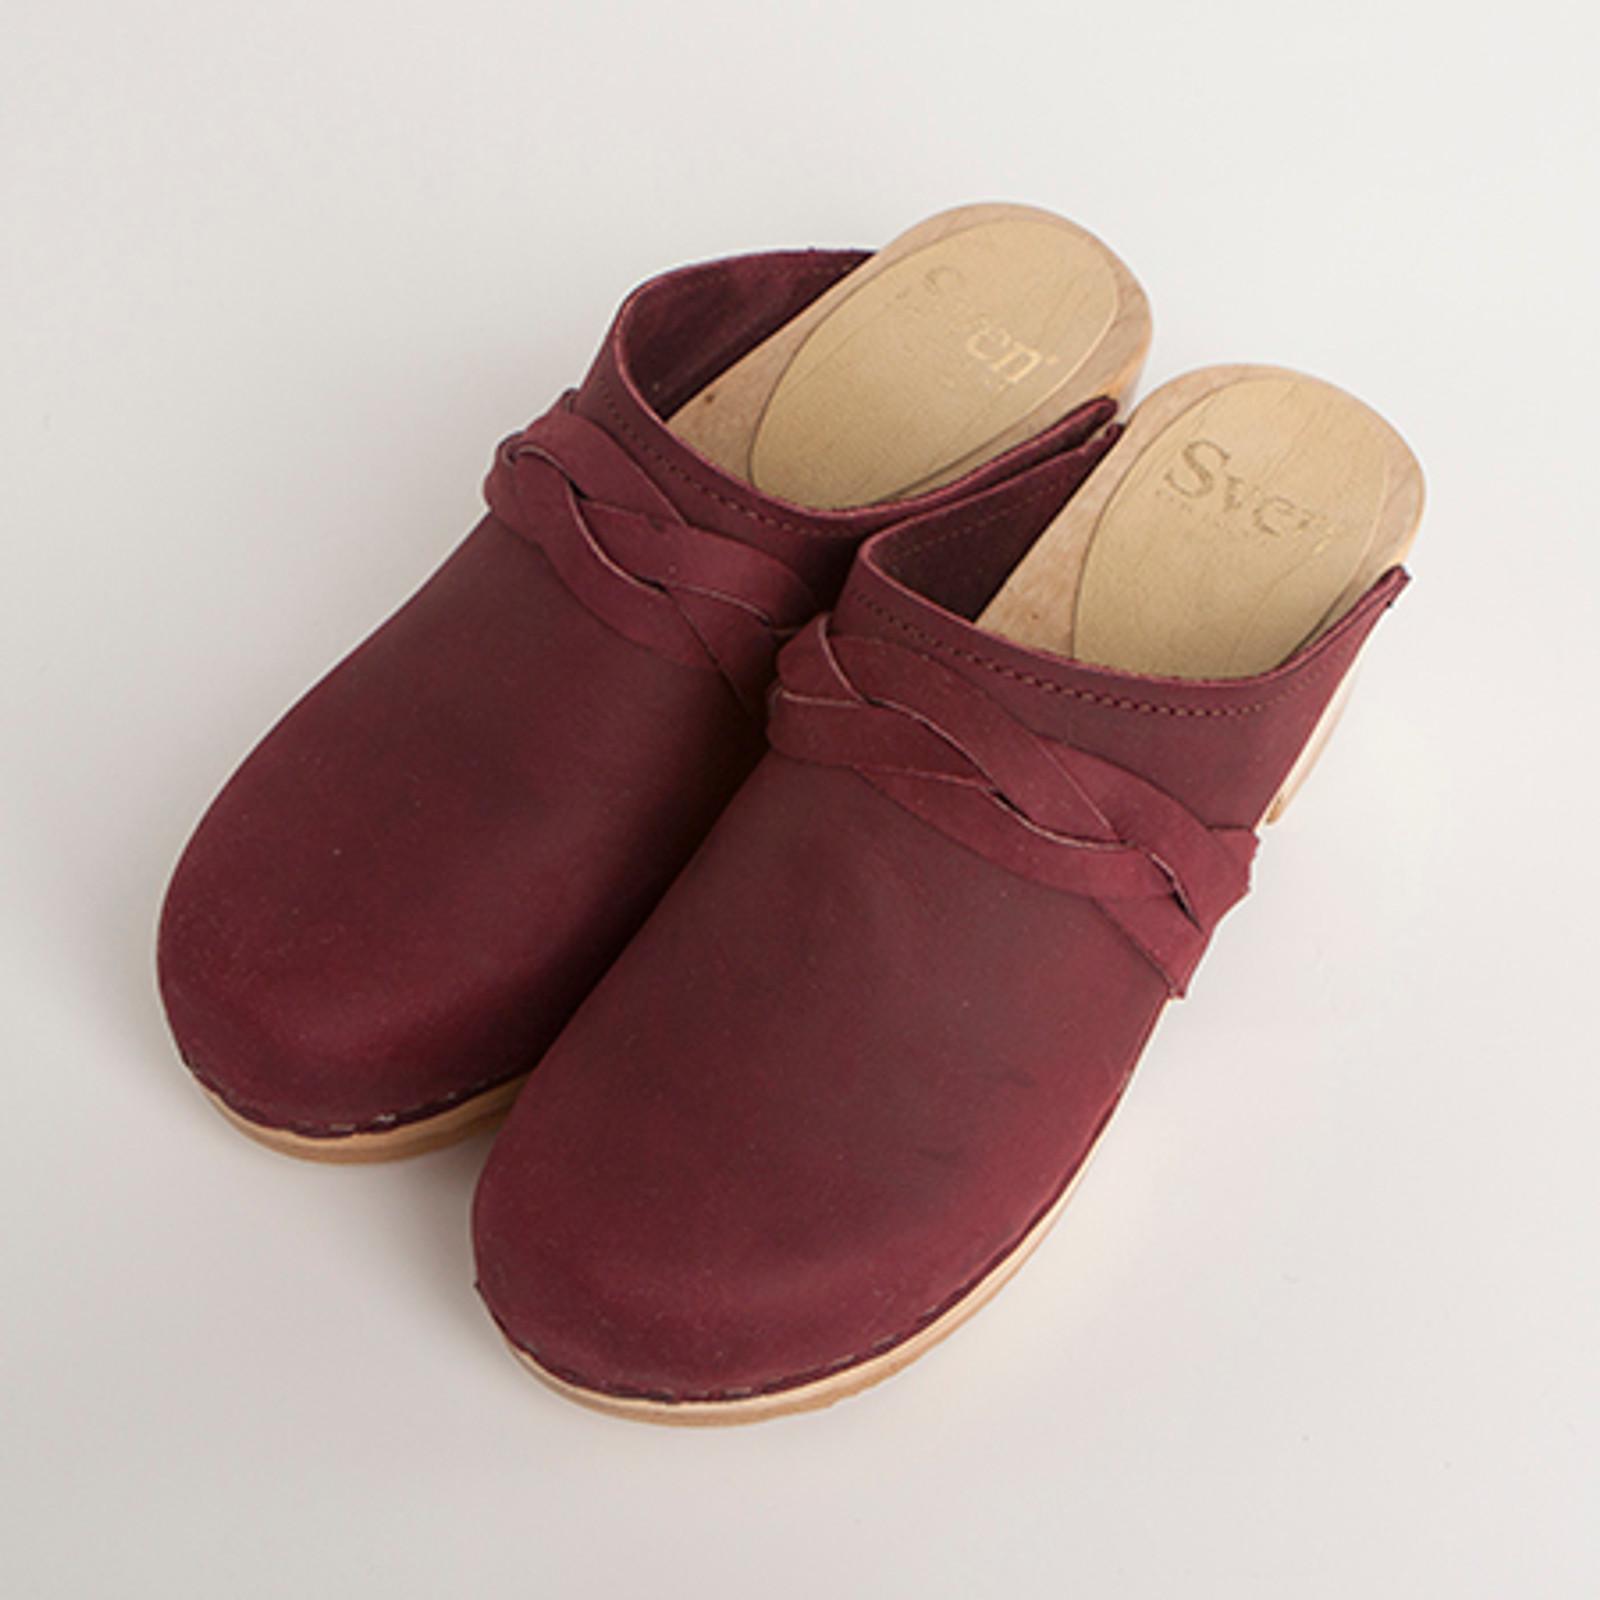 Braid Clogs - Mid Heels